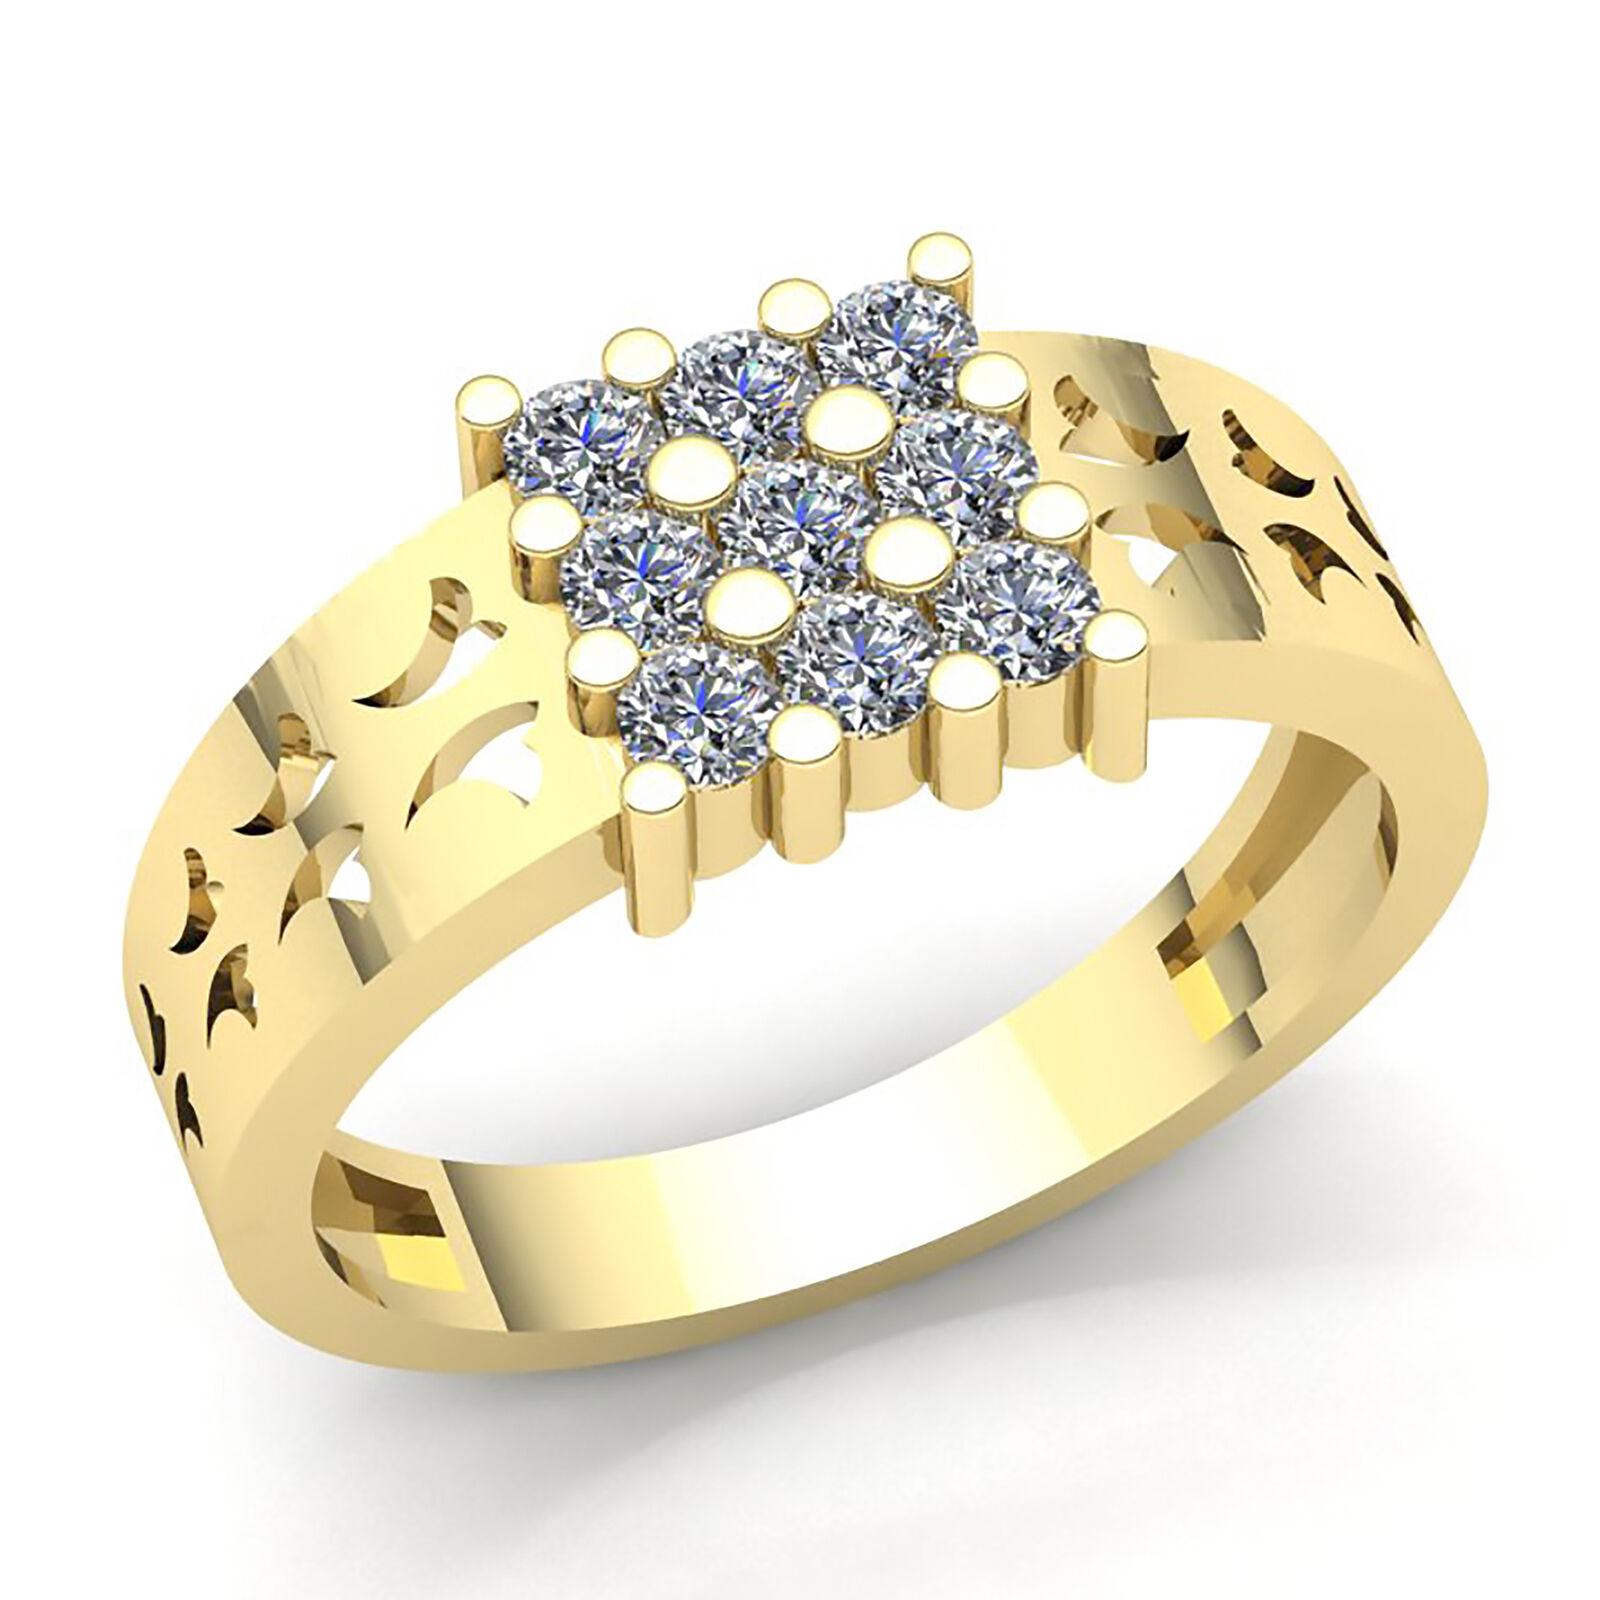 Genuine 1ct Round Cut Diamond Men's Cluster Anniversary Ring 10K gold